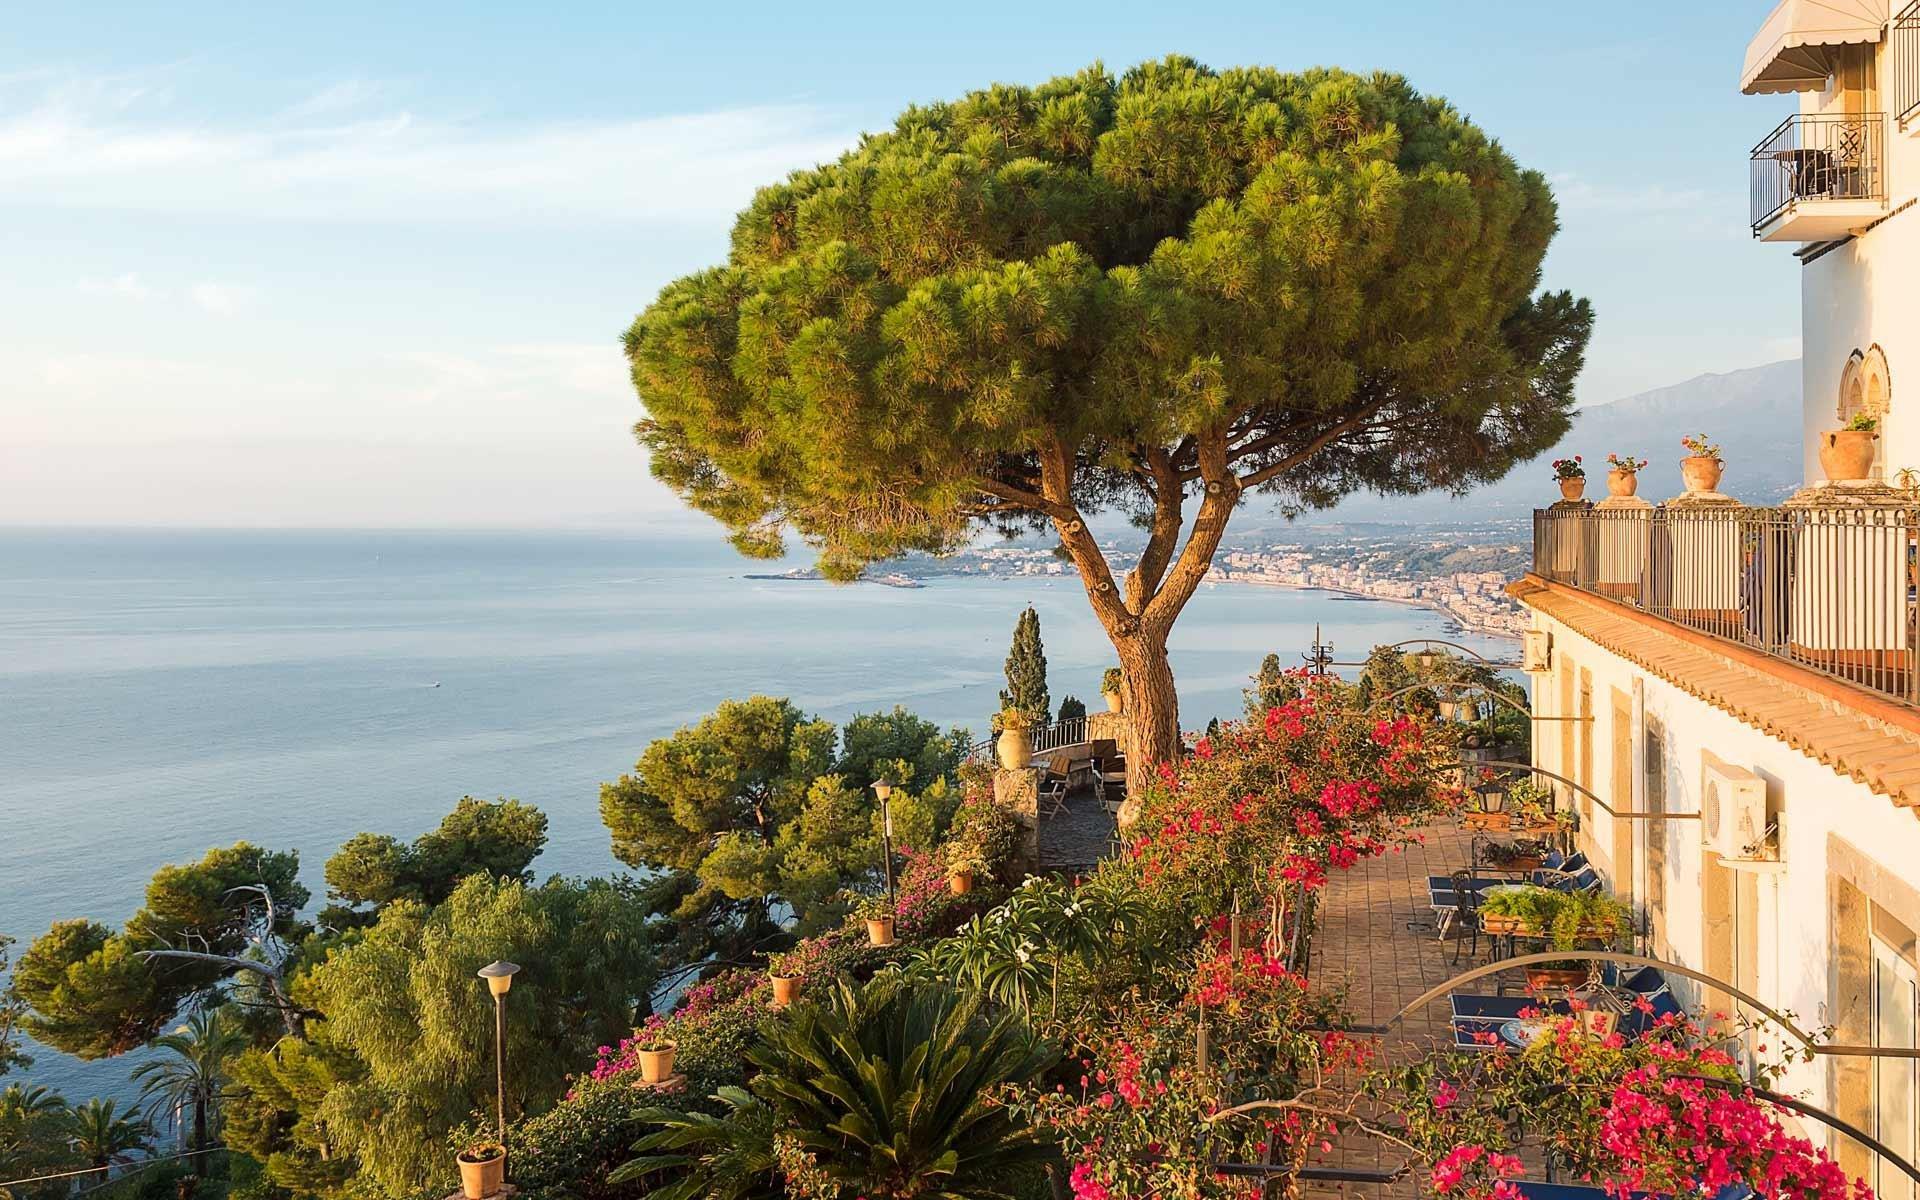 Bel Soggiorno Hotel - Taormina (ME) - Official reservation ...